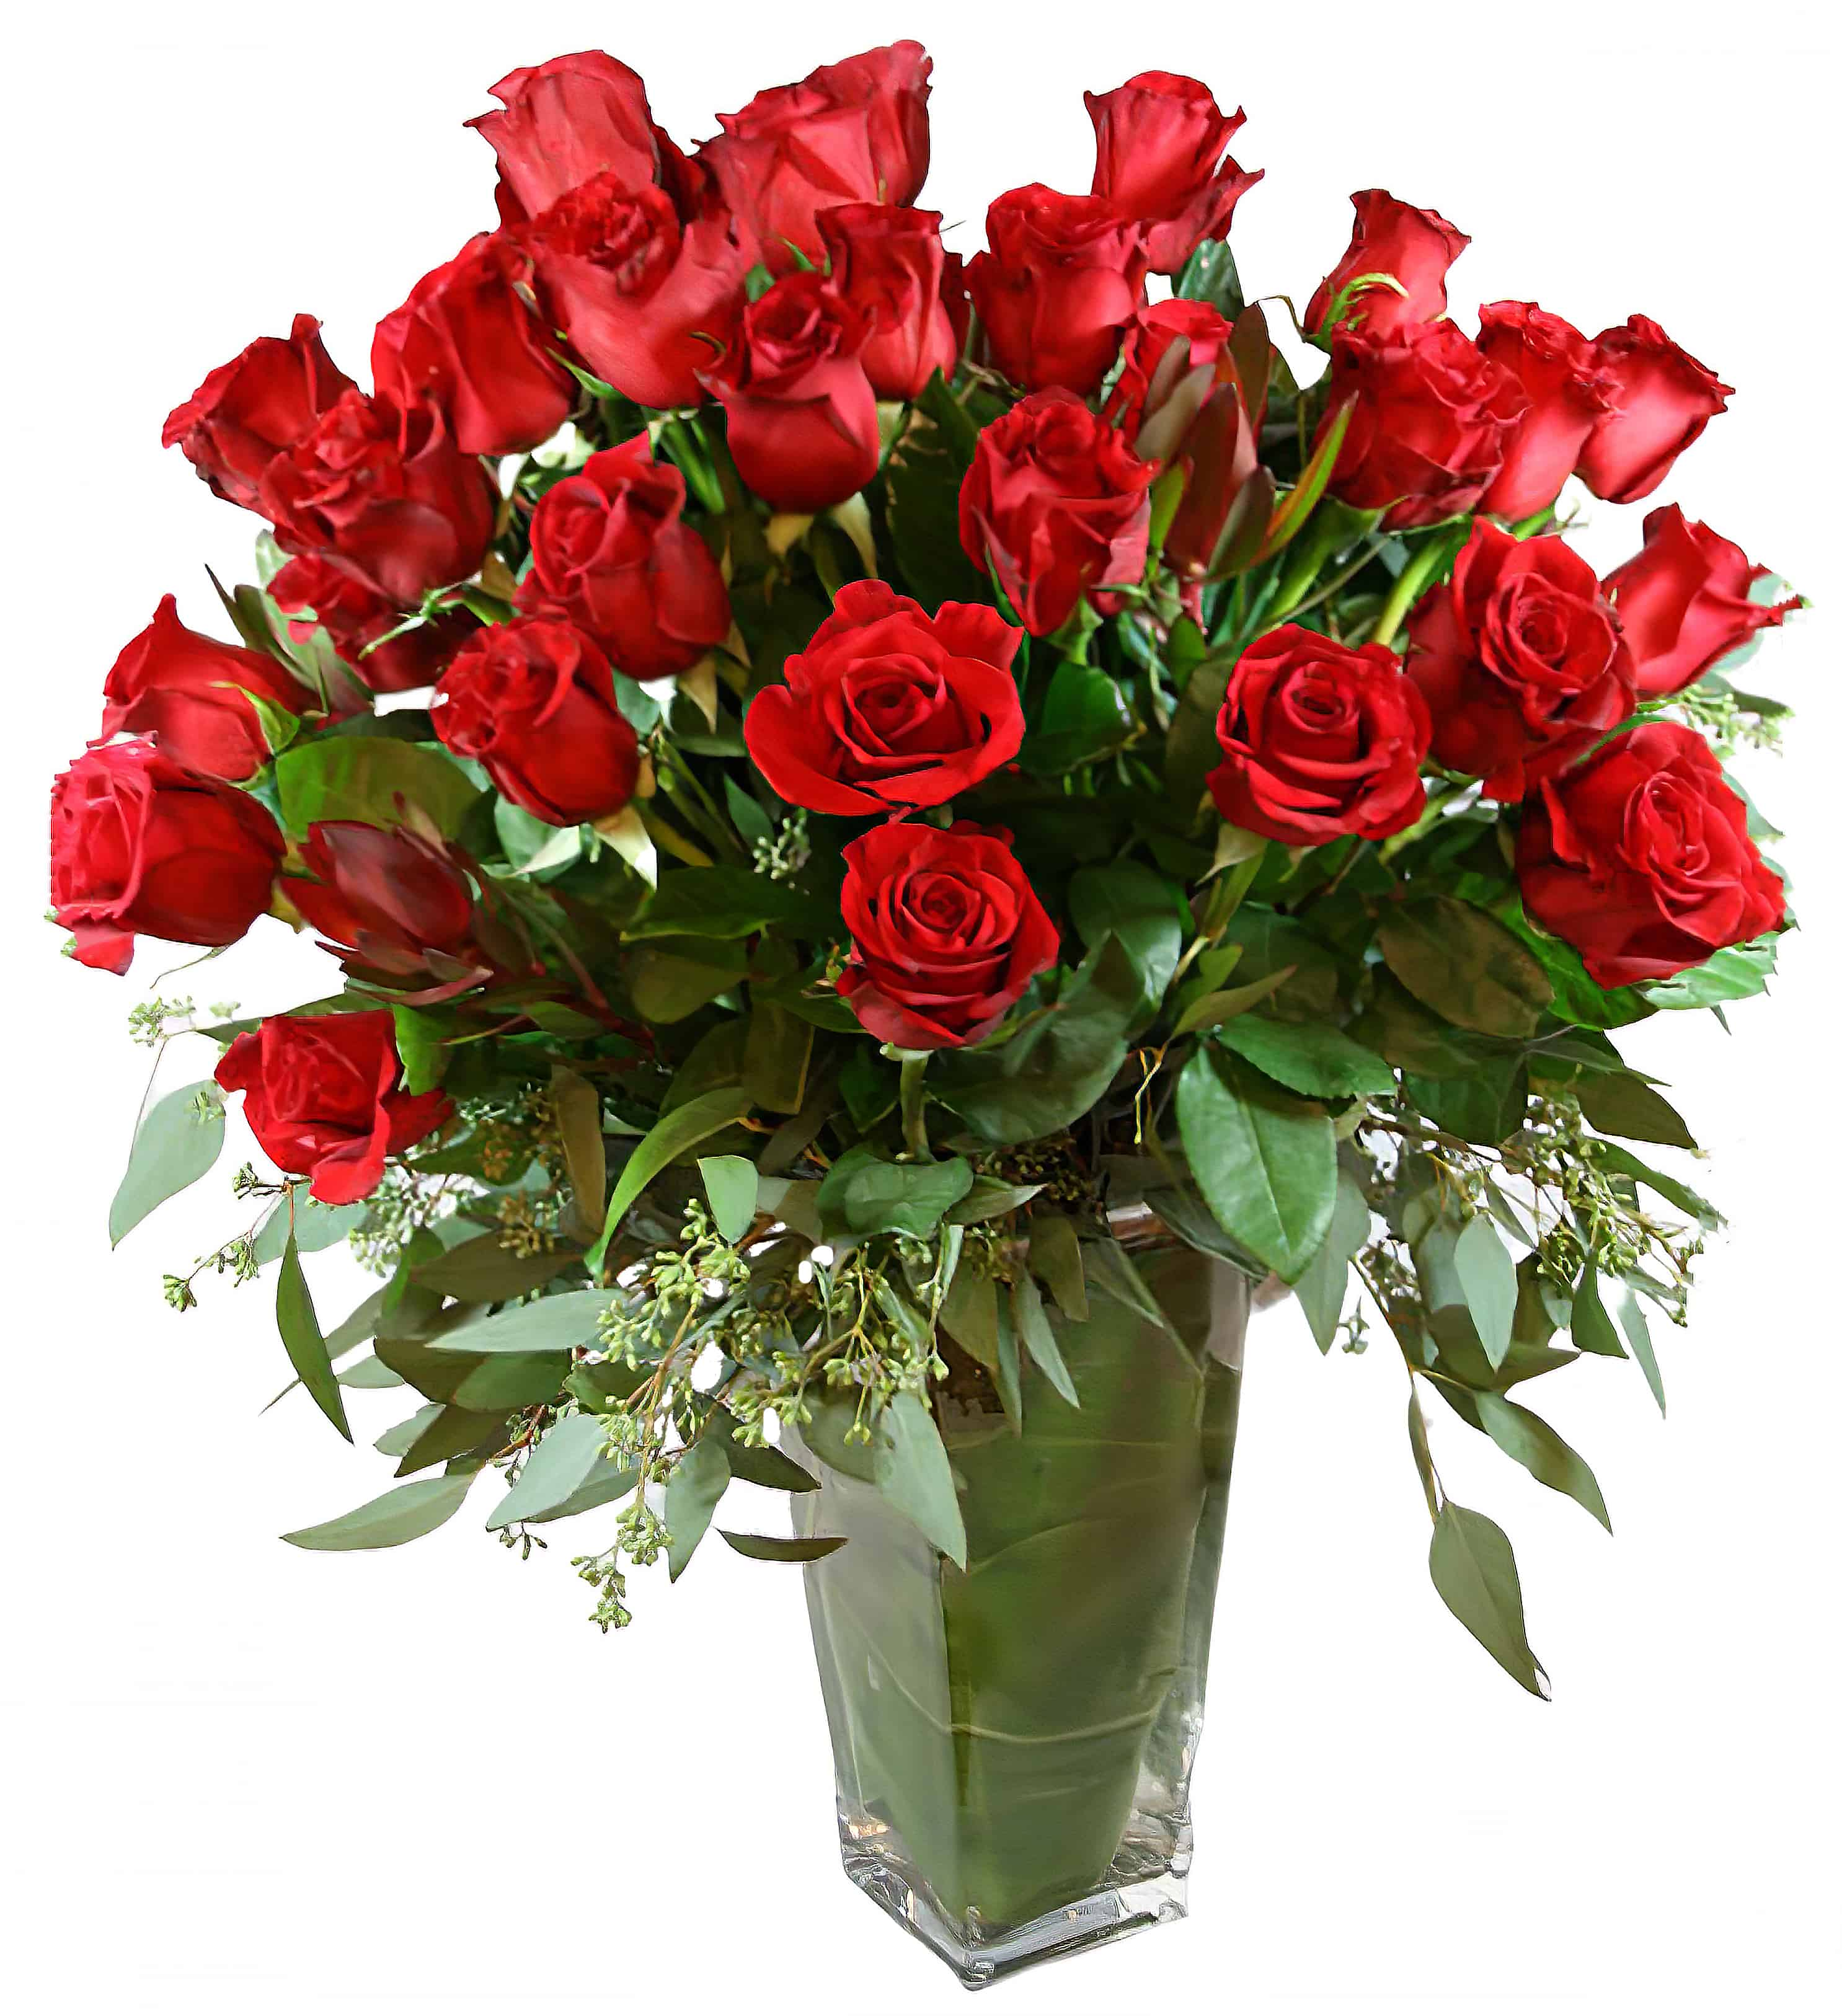 4 Dozen Flowers - Valentine Famoso Roses